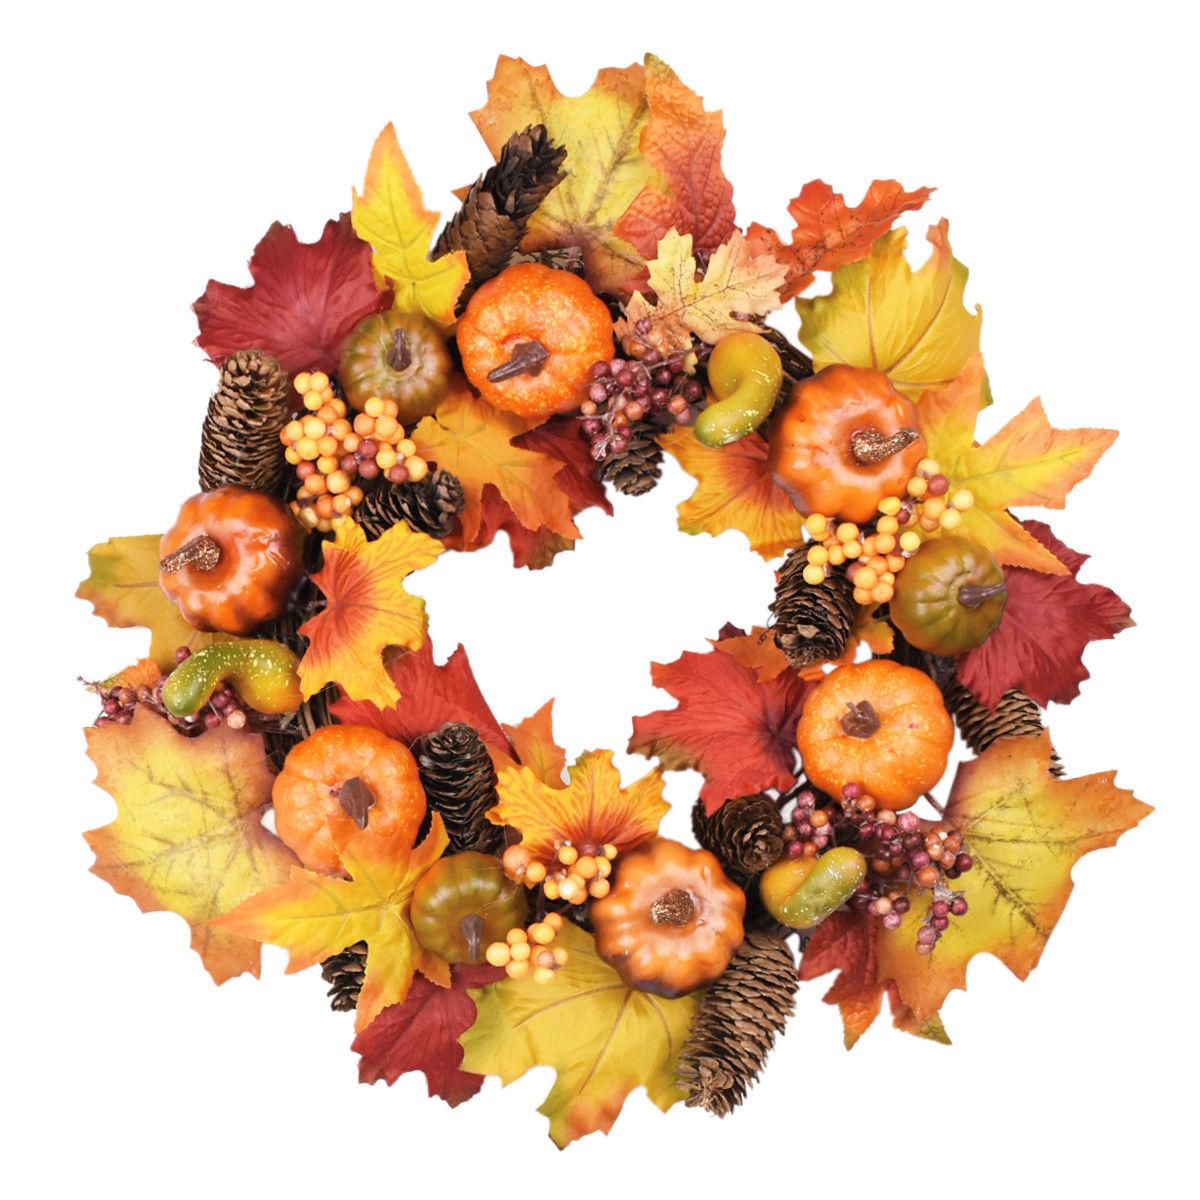 Thanksgiving Maple Leaf Garland Pumpkin Wreath Halloween Christmas Decorations